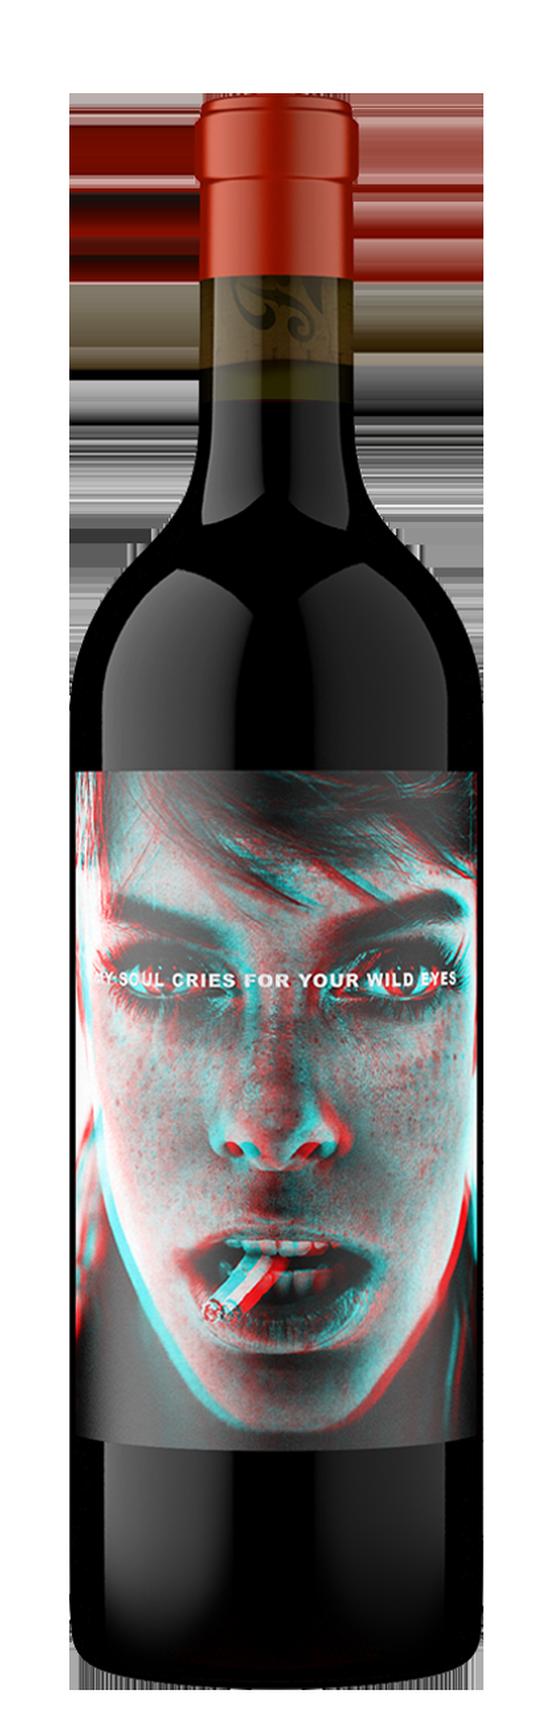 2017 Wild Eyes, Red Wine, Napa Valley